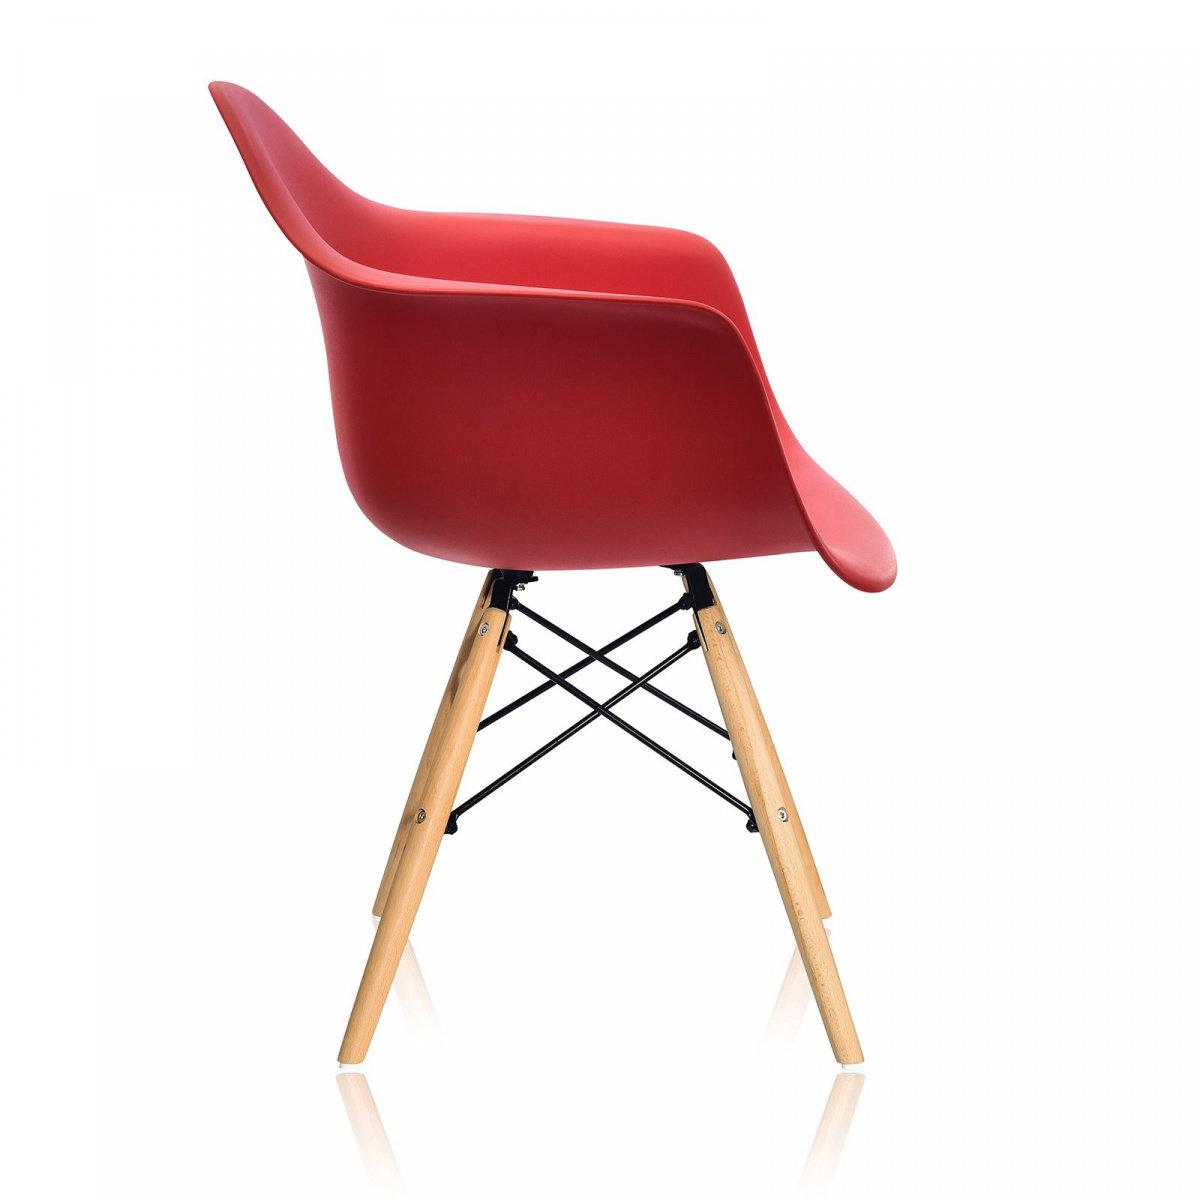 Стул-кресло Eames Style DAW (Эймс Стайл ДАВ)